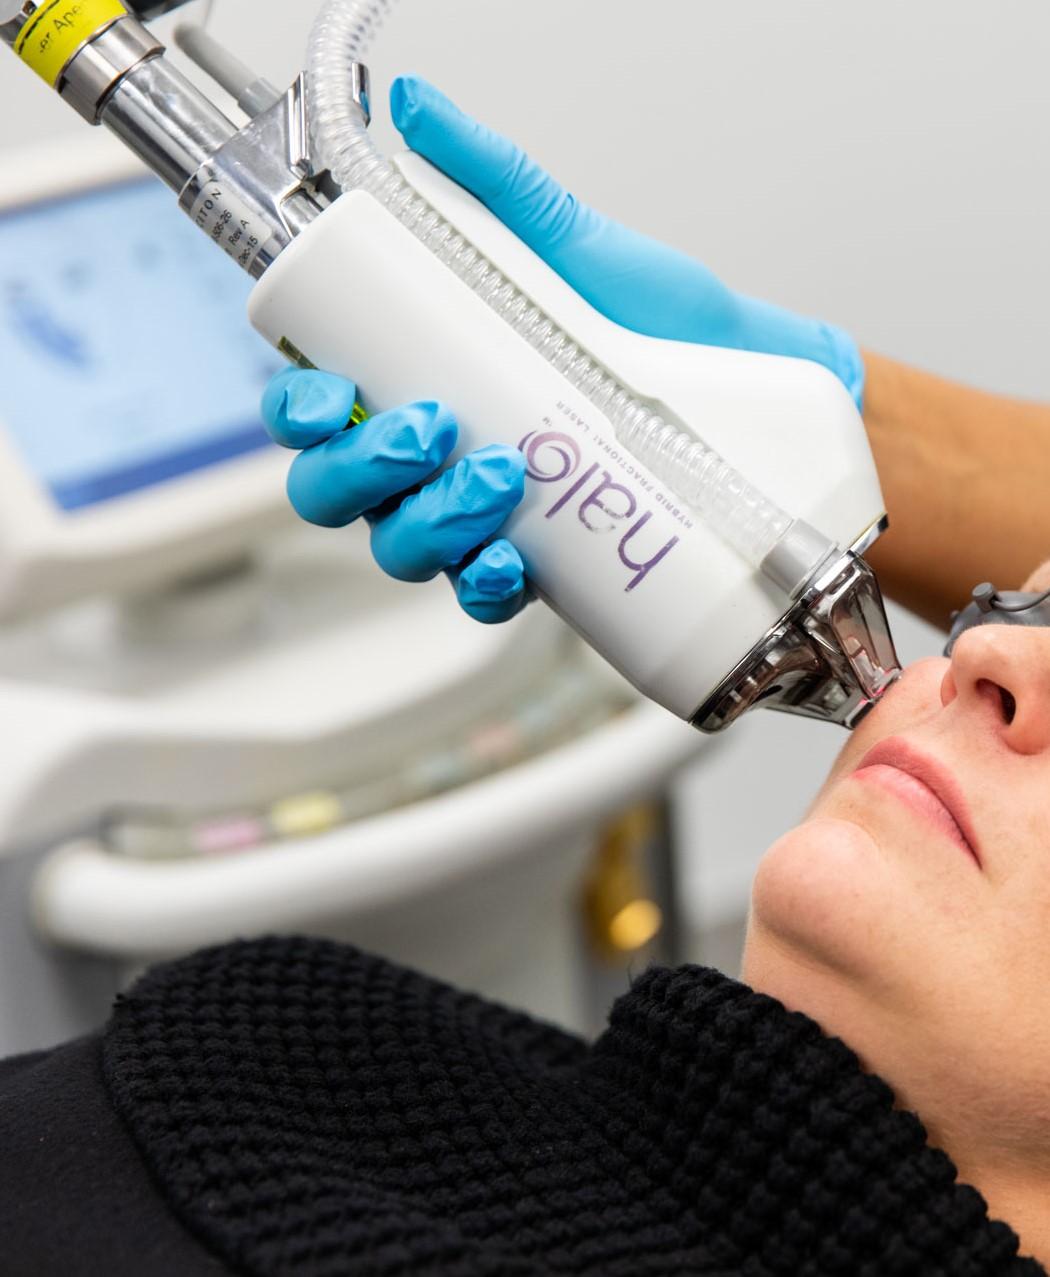 Laser Treatment in Orlando, Florida | Affinity Med Spa & Wellness Center